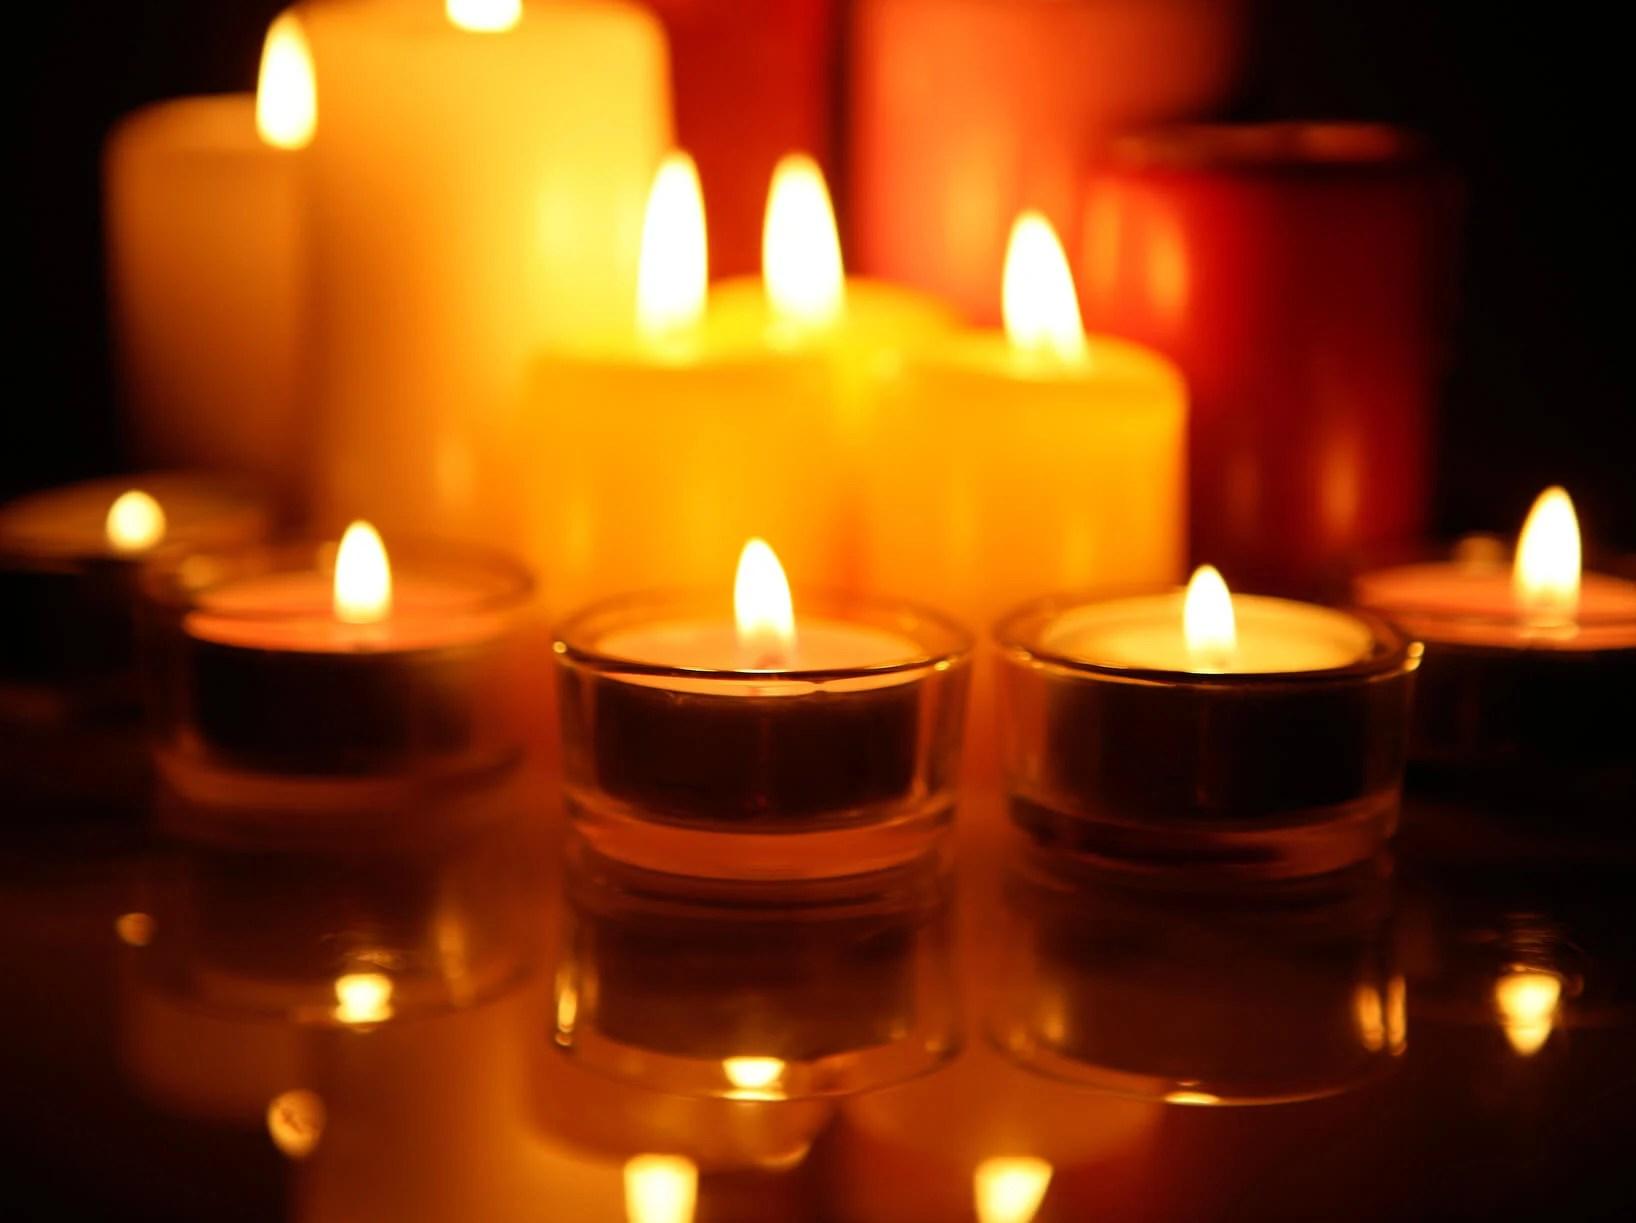 worldwide candle lighting day 13th